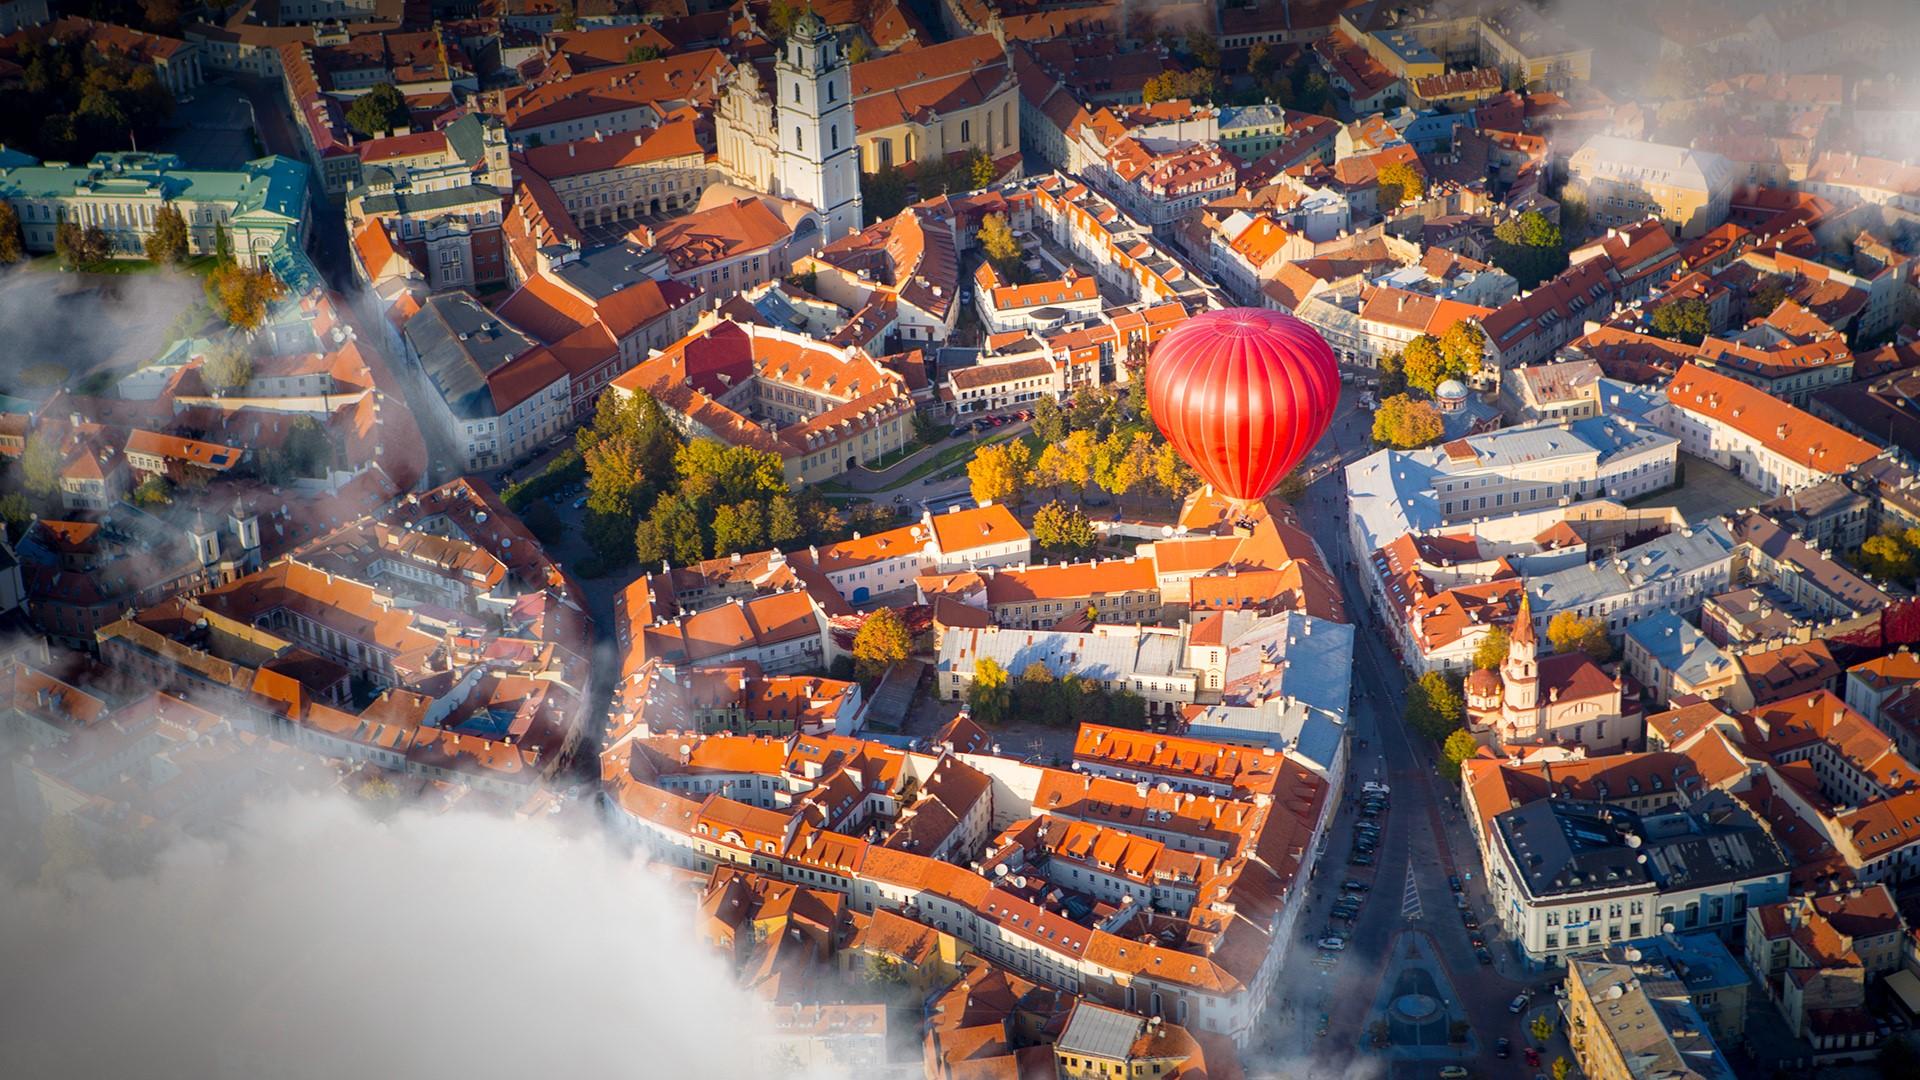 Hot Air Balloon Flying Over Vilnius Lithuania Windows 10 Spotlight Images